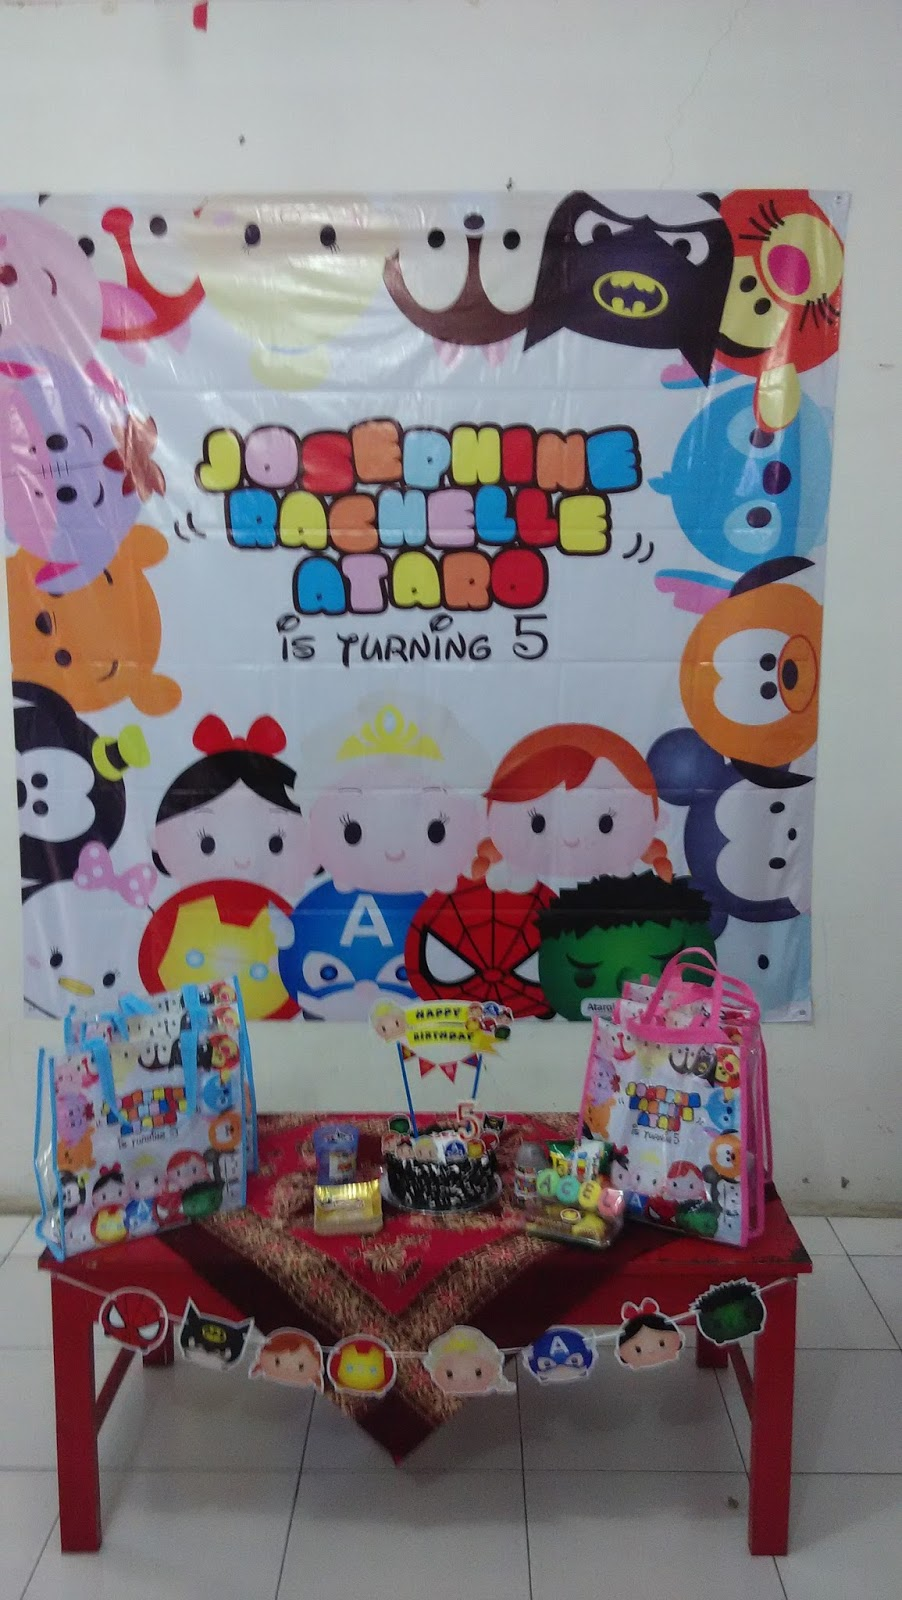 Ataro Designs Undangan Stiker Label Ulang Tahun Anak Tema